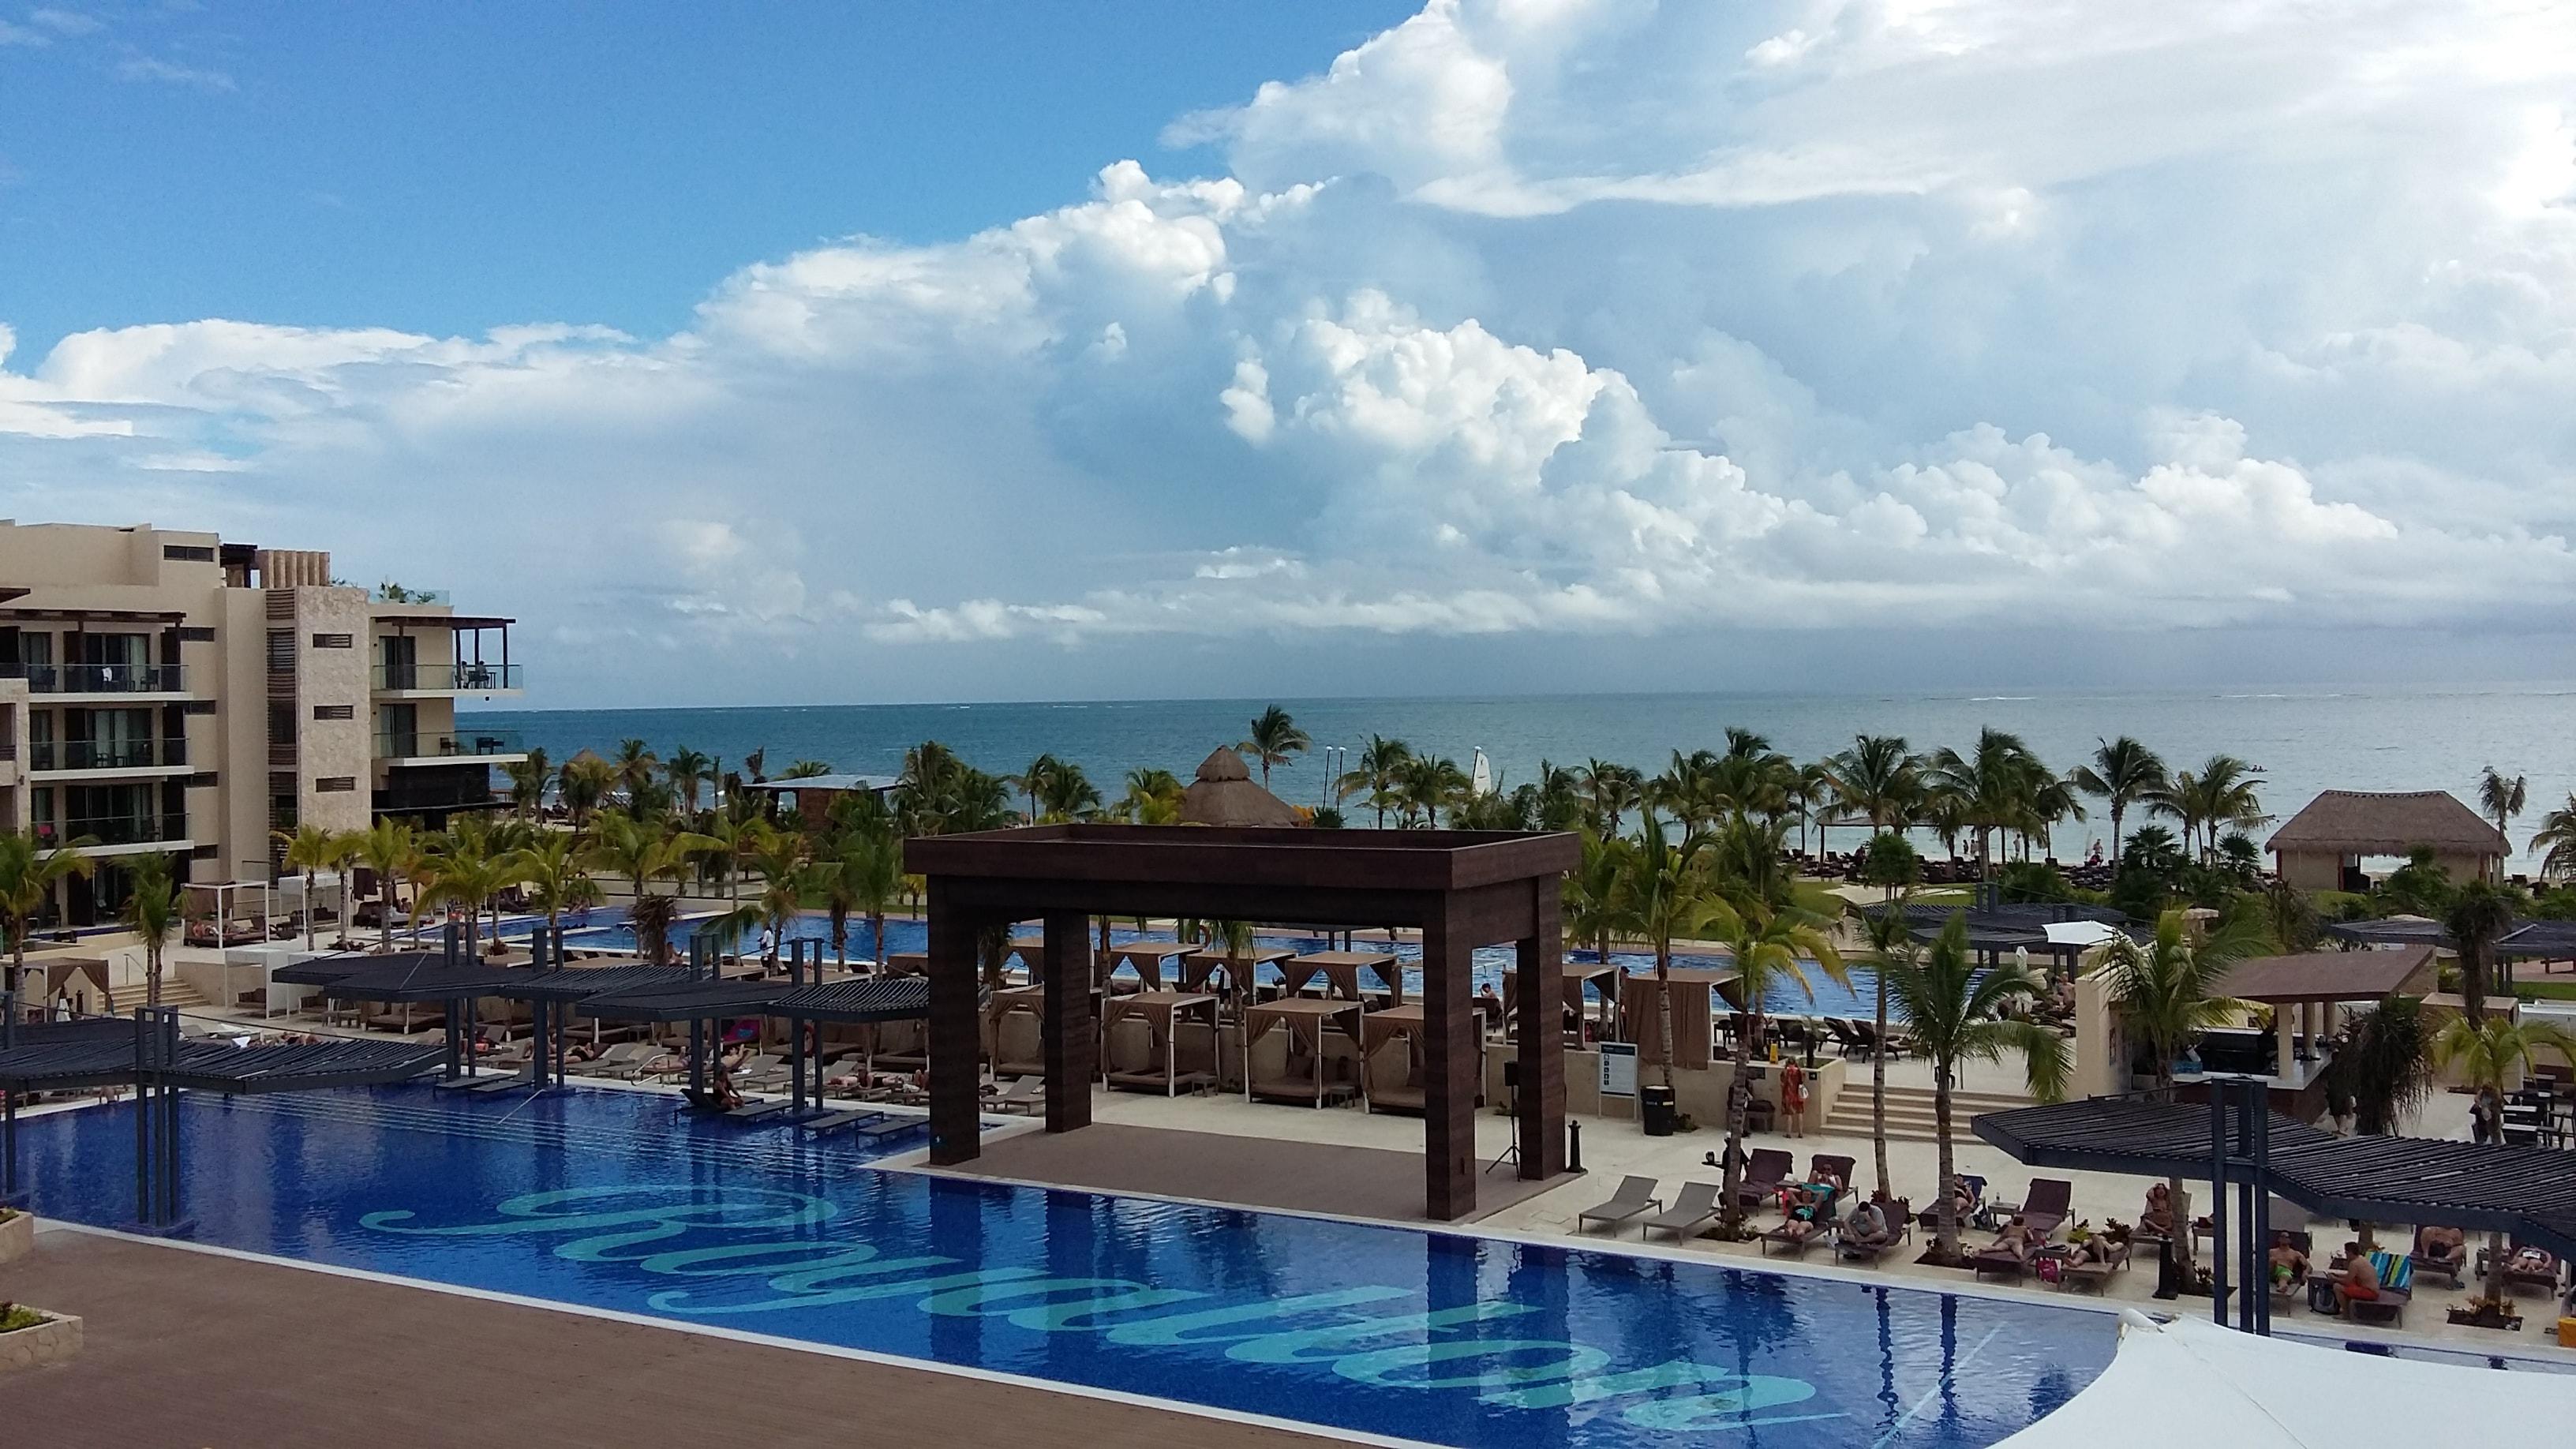 Royalton Riviera Cancun aerial view